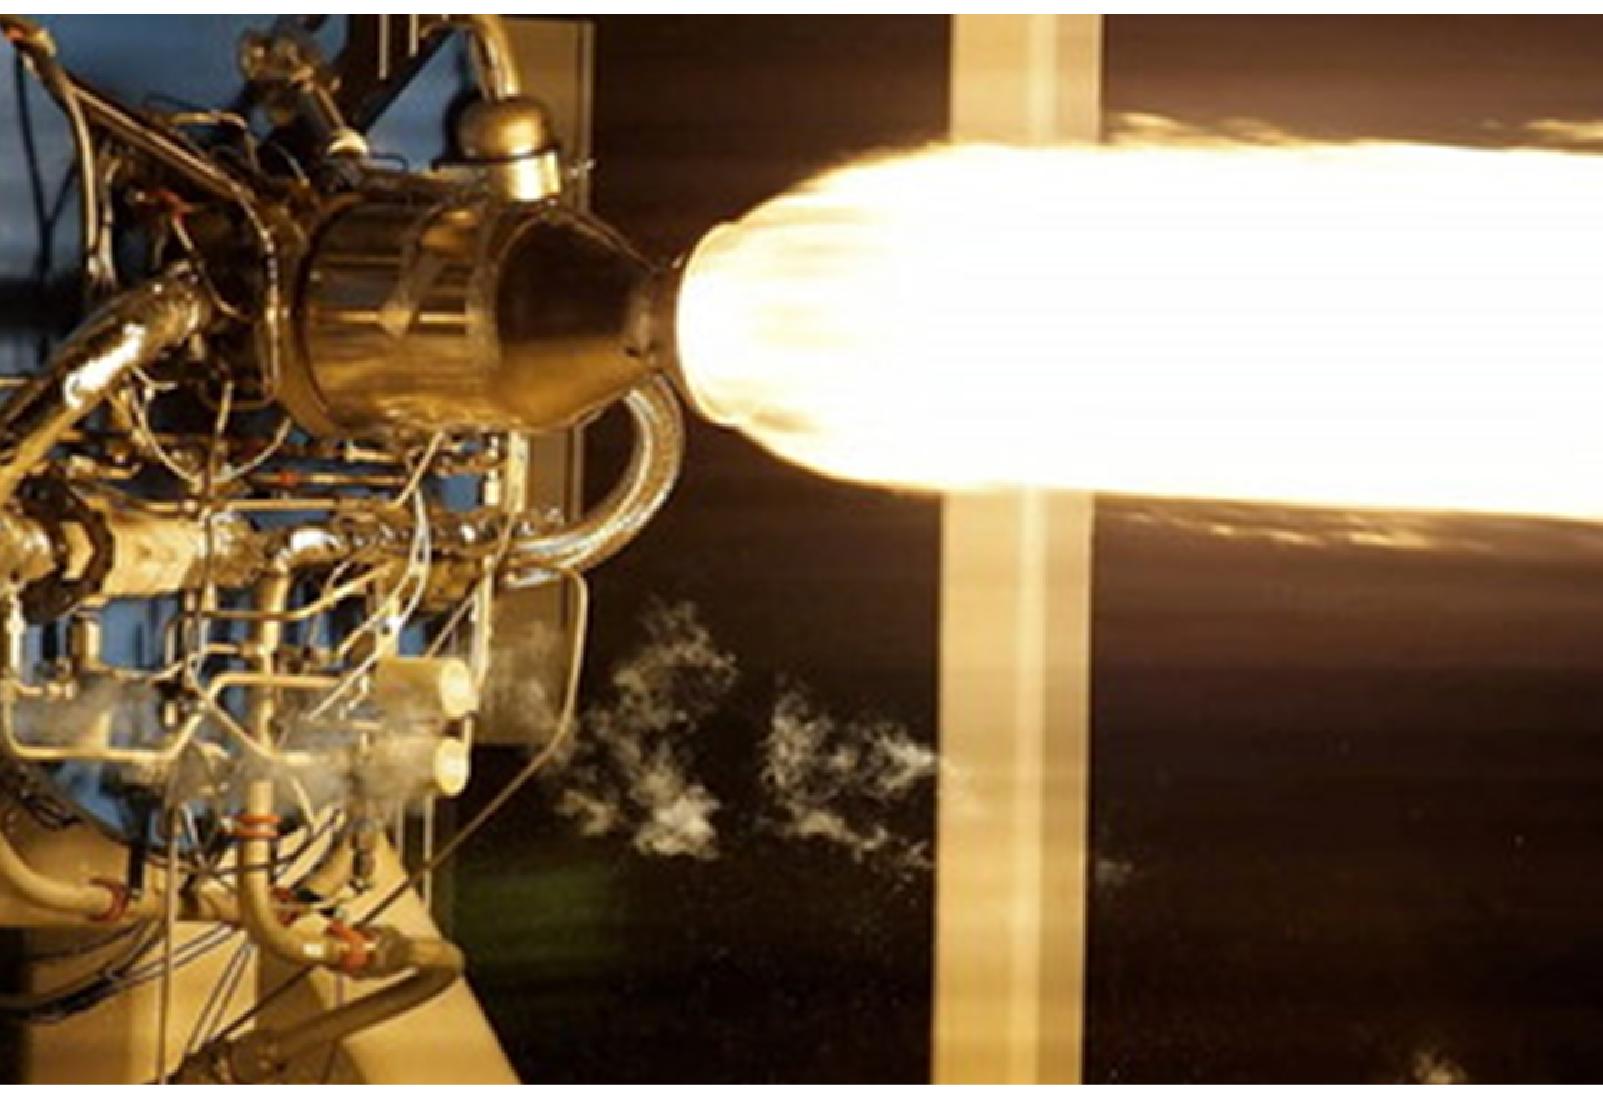 Rocket motor firing using LOX and RP1 Fuiel Mixture